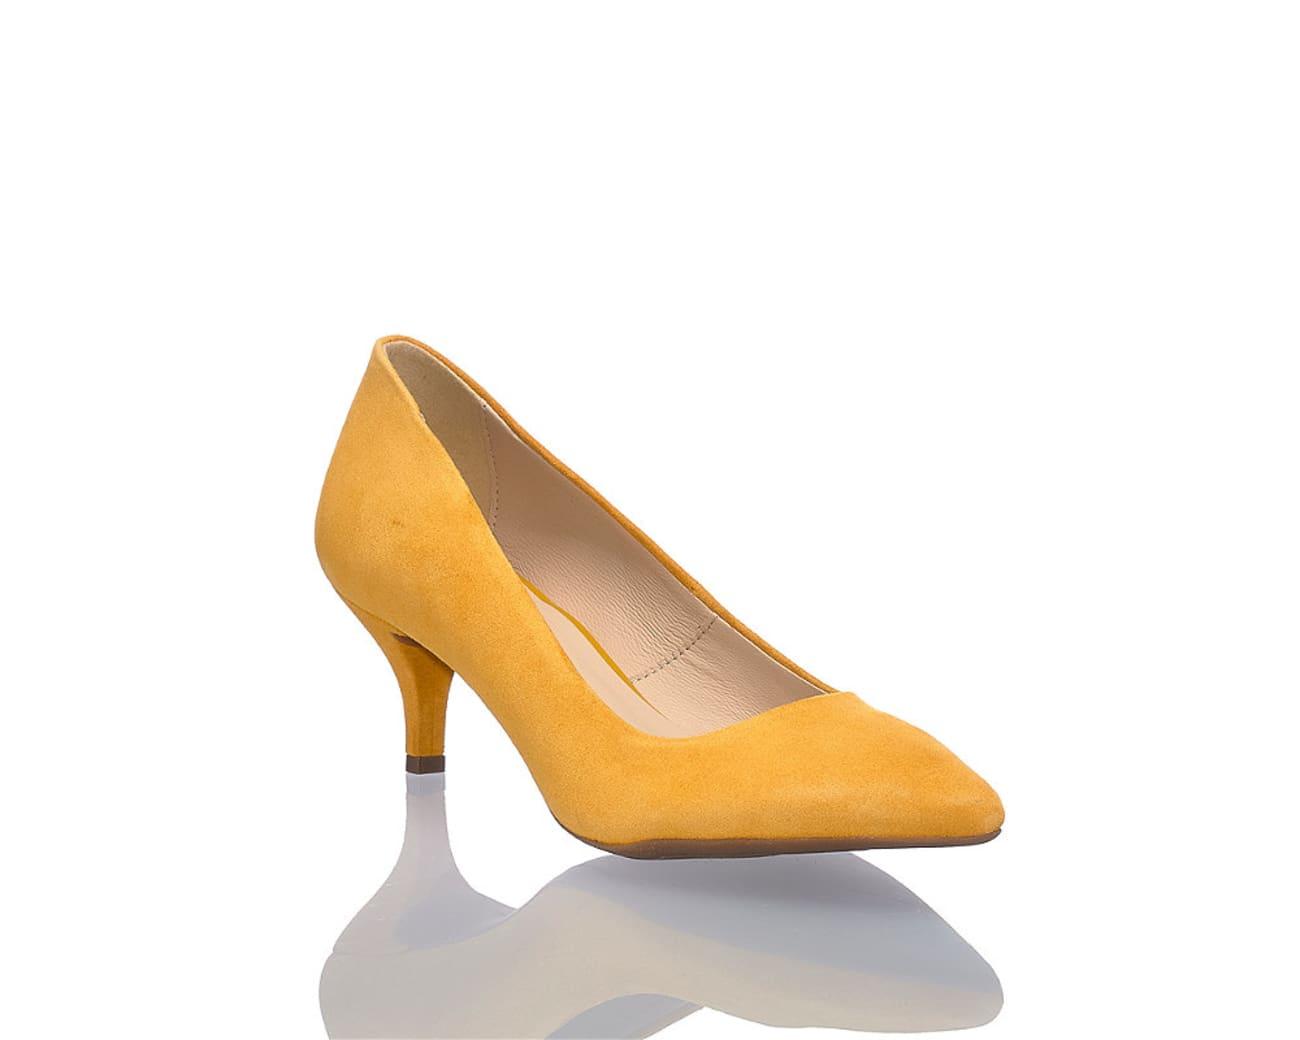 d7084c15a9cdbc Varese Anina Damen Pumps gelb